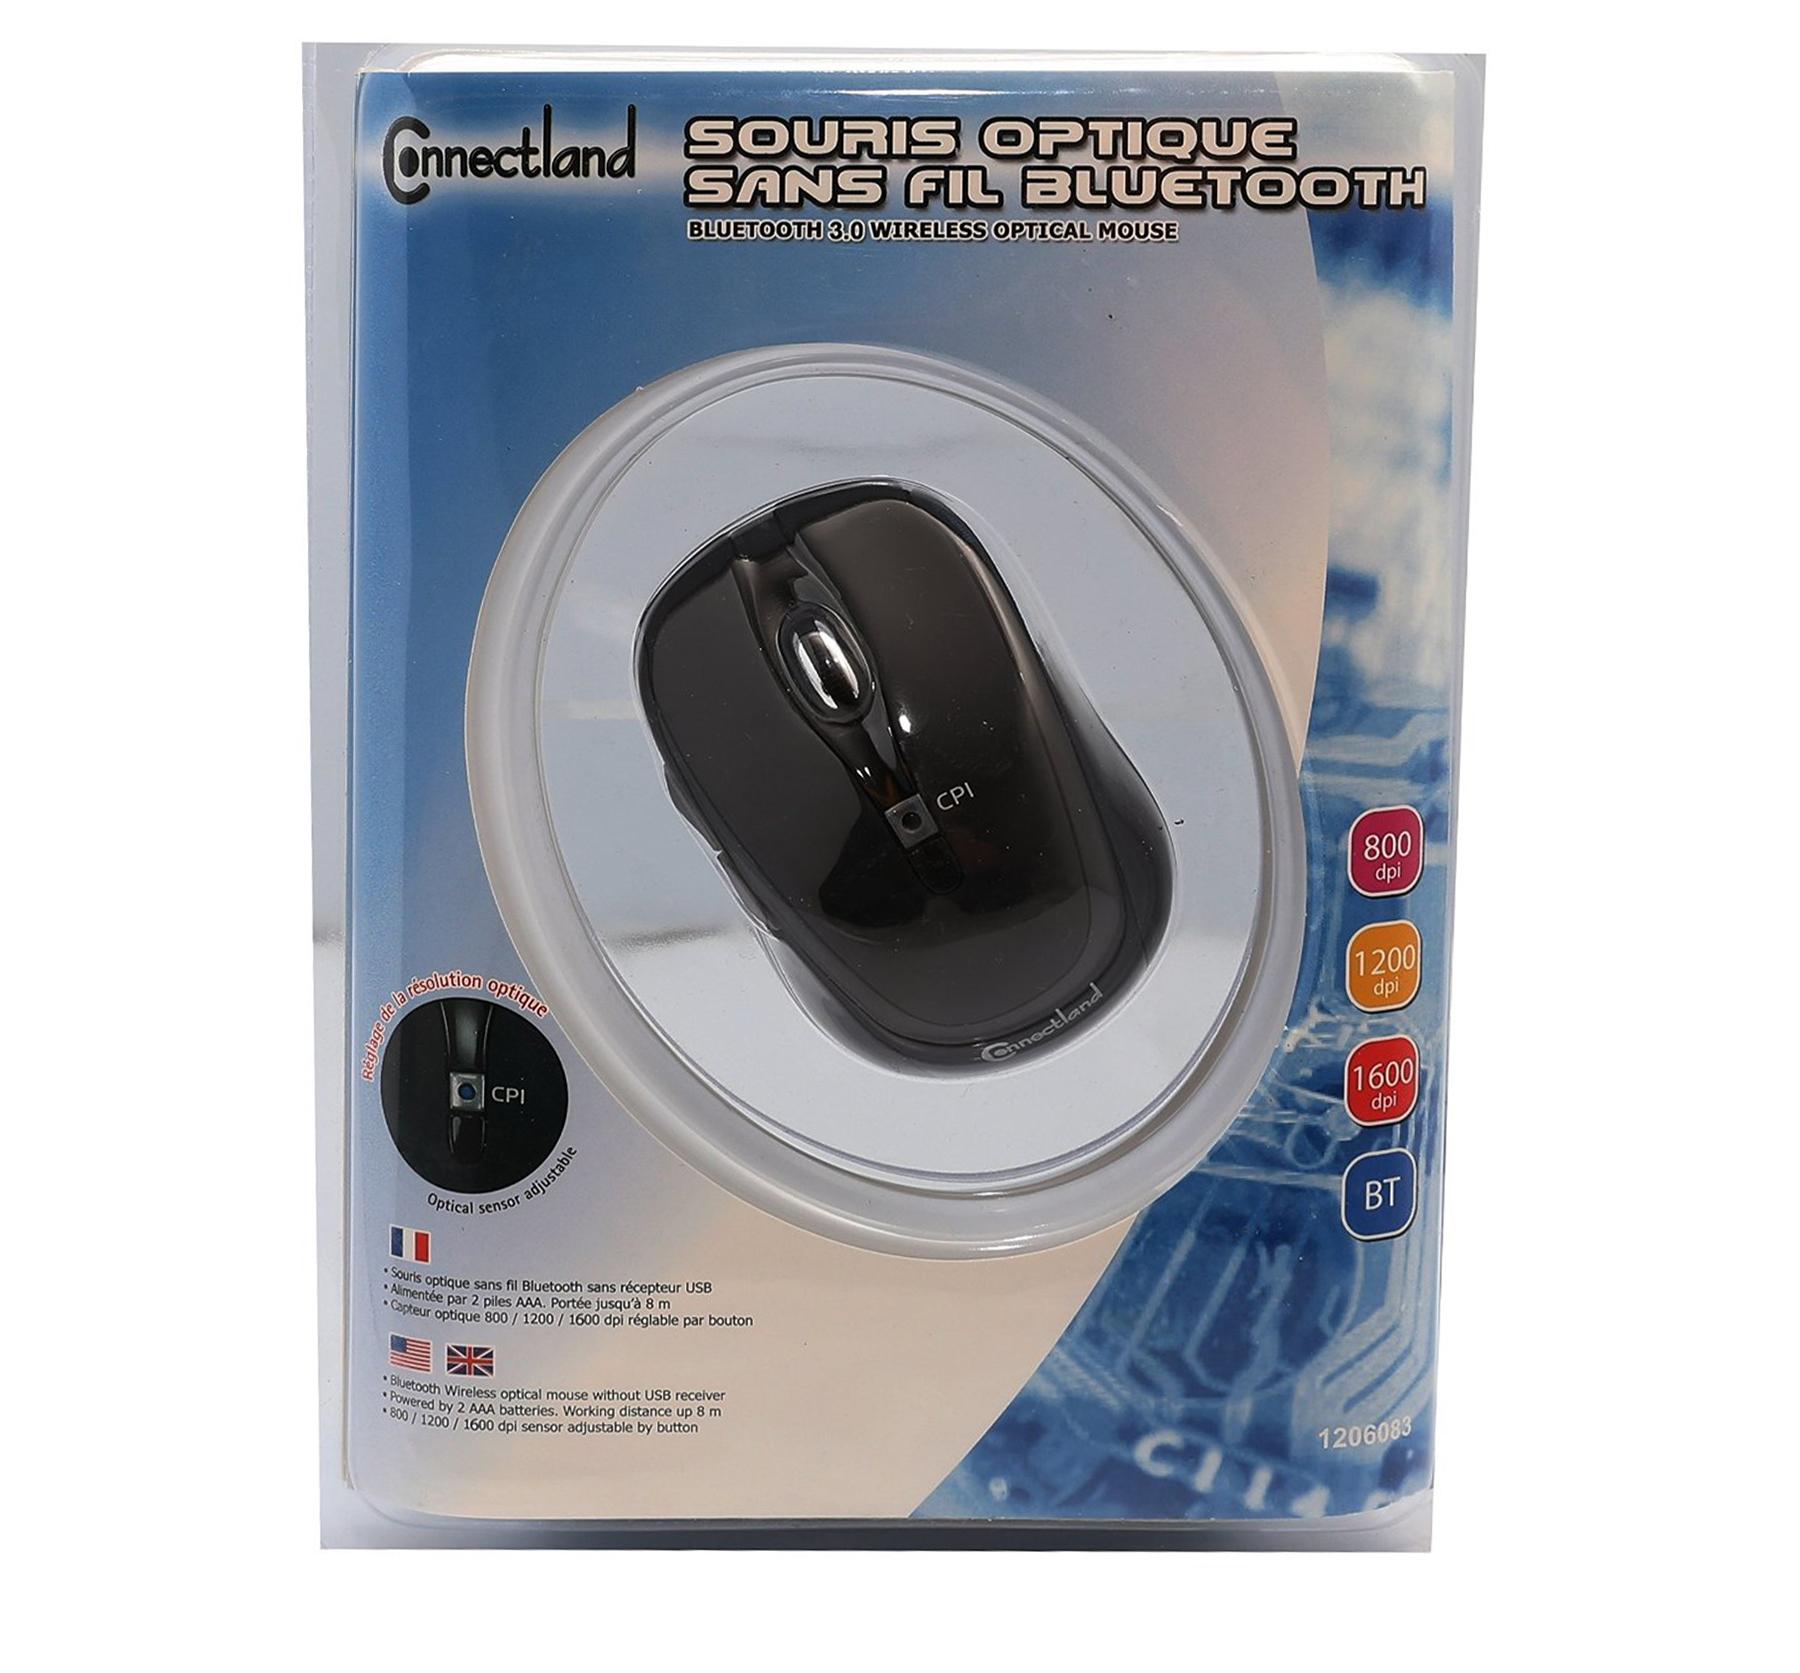 Color : Sapphire Blue+Exclusive Color Box GUODLIN Wireless Business Office Mouse with Unique Silent Click 800//1200//1600 DPI Ergonomic Grips 6 Button Design 5 Colors Can be Choose